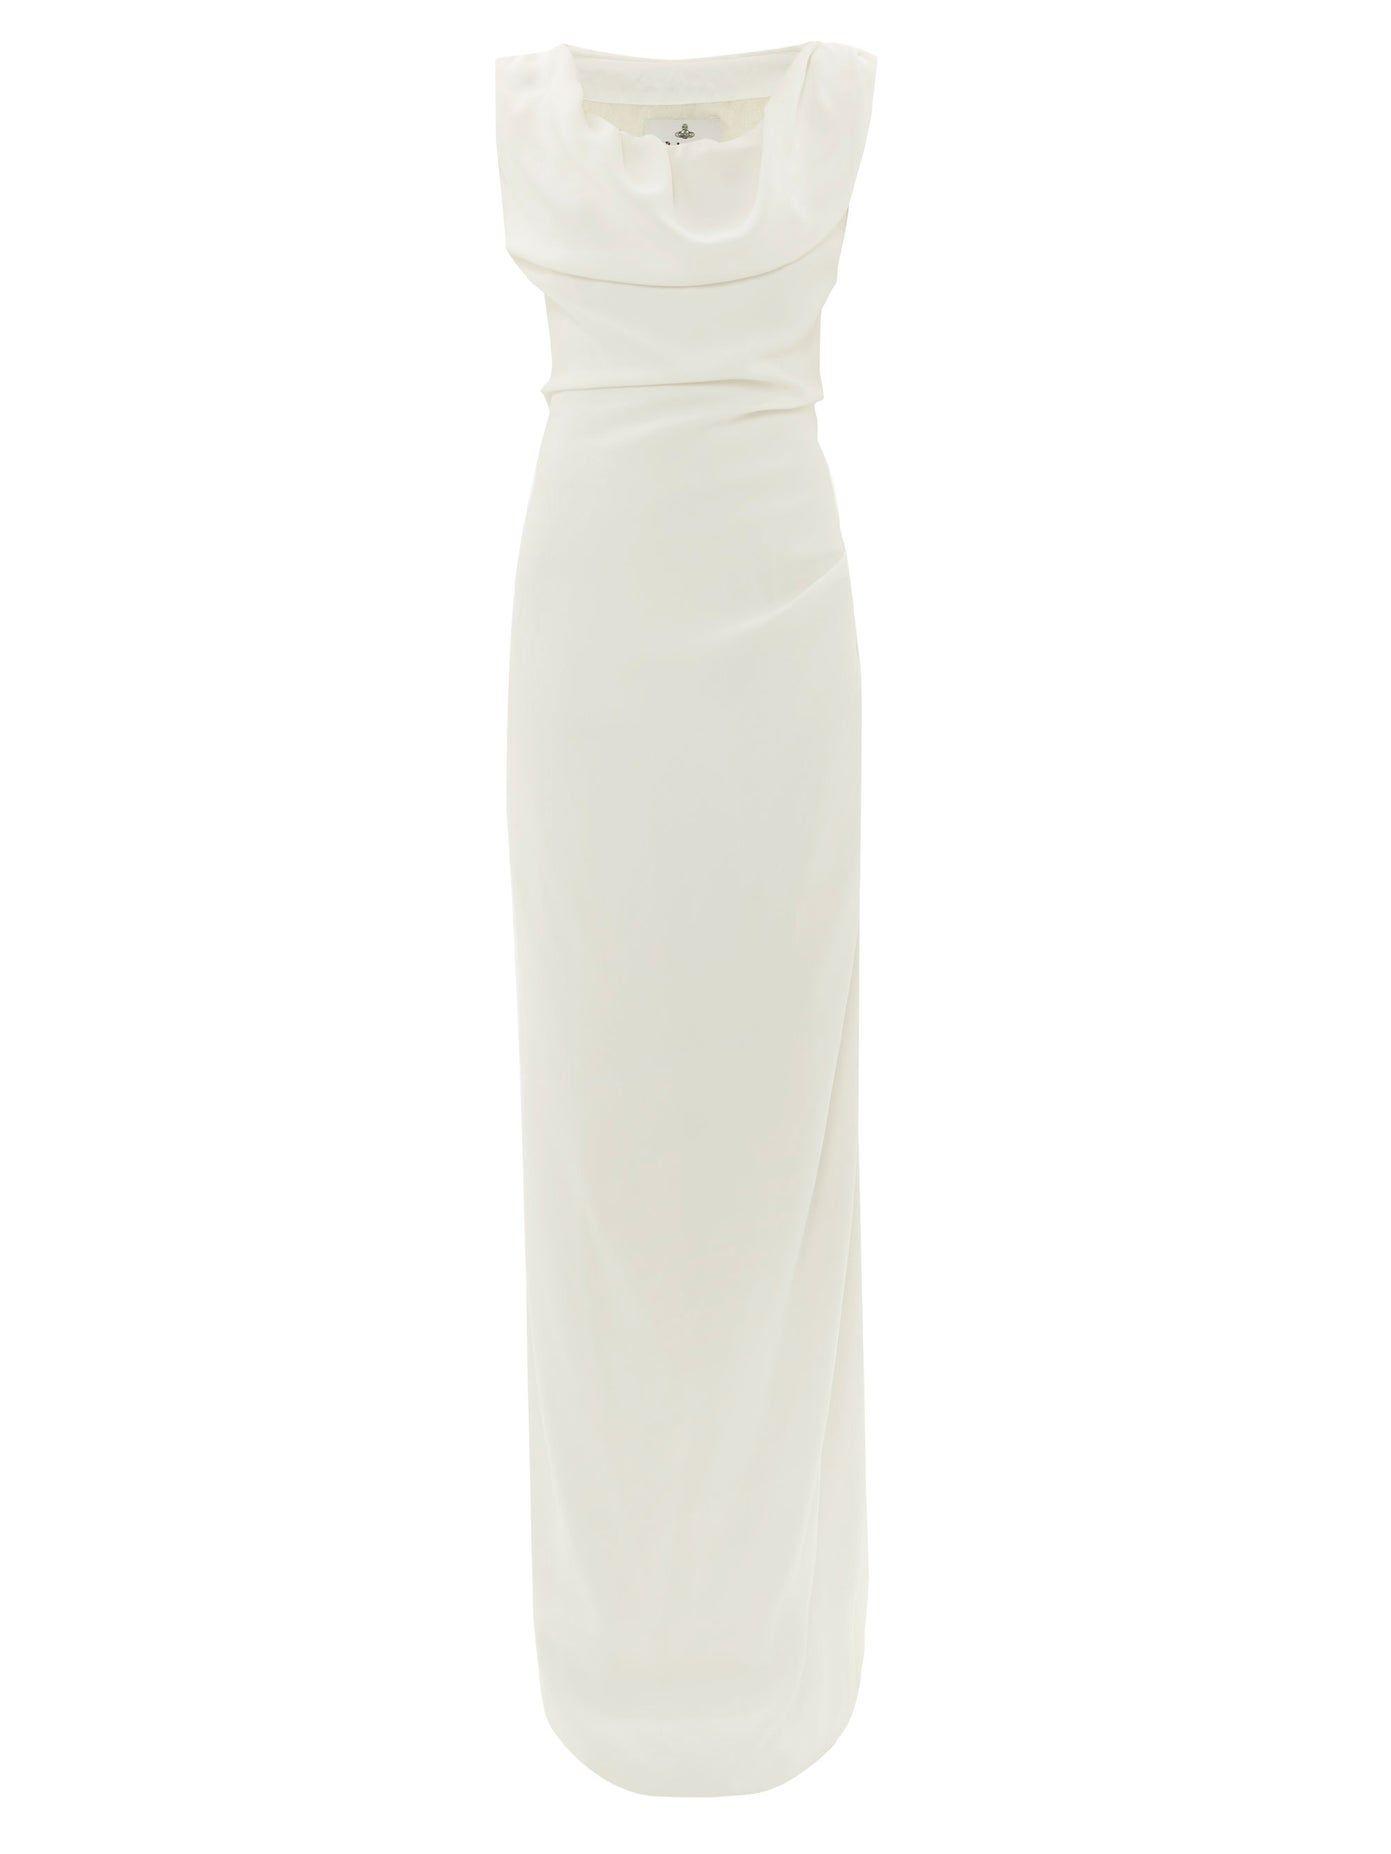 Ginnie Draped Off The Shoulder Satin Dress Vivienne Westwood Vivienne Westwood Wedding Dress Satin Dresses Vivienne Westwood [ 1854 x 1391 Pixel ]